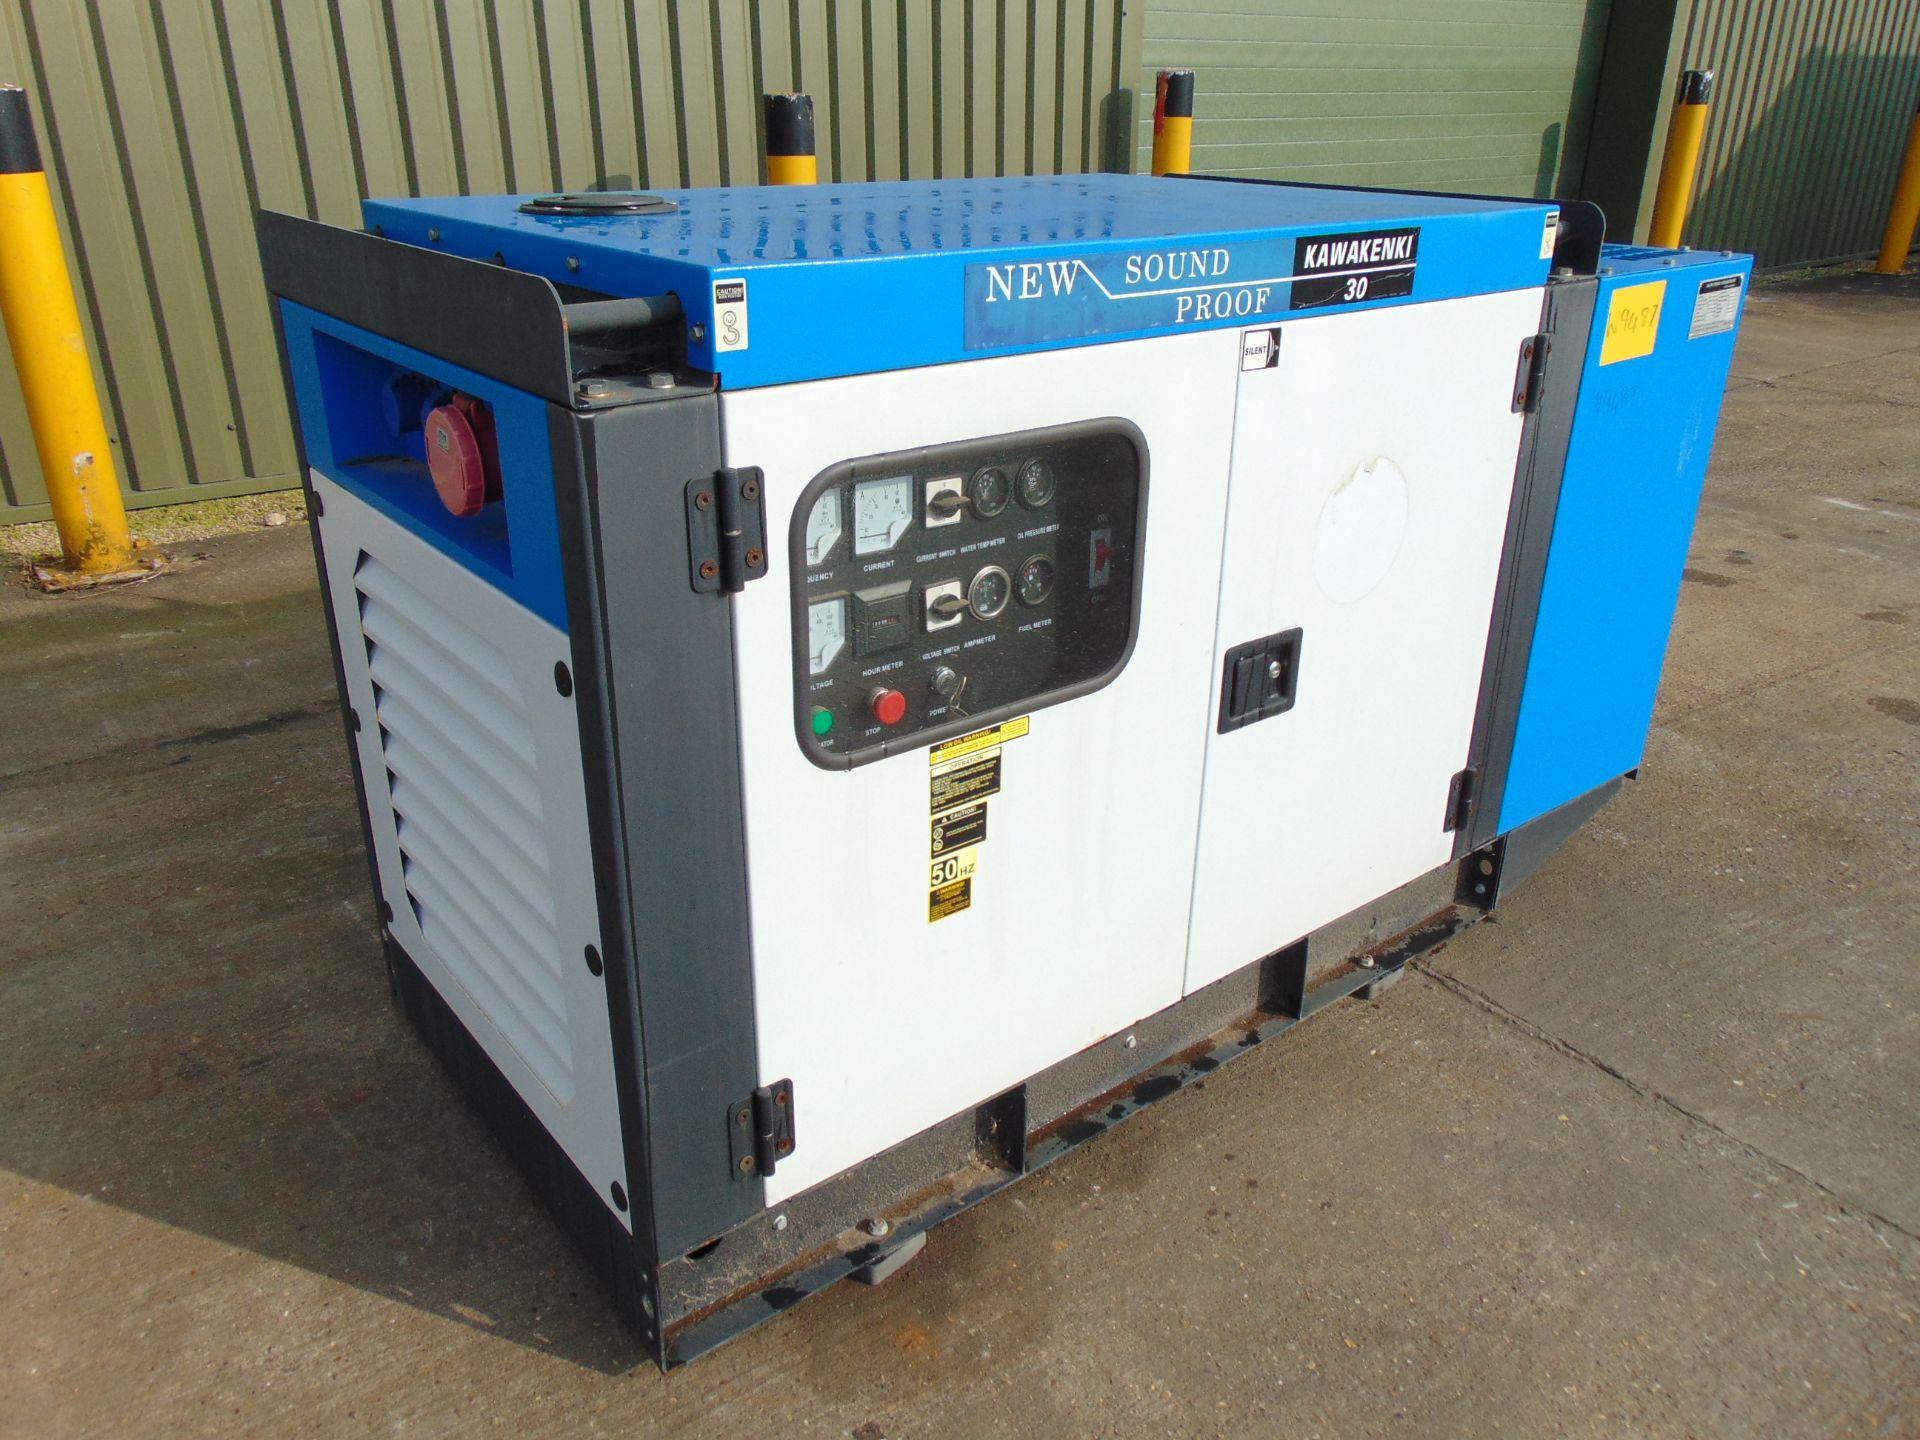 Lot 29 - UNISSUED 30 KVA 3 Phase Silent Diesel Generator Set